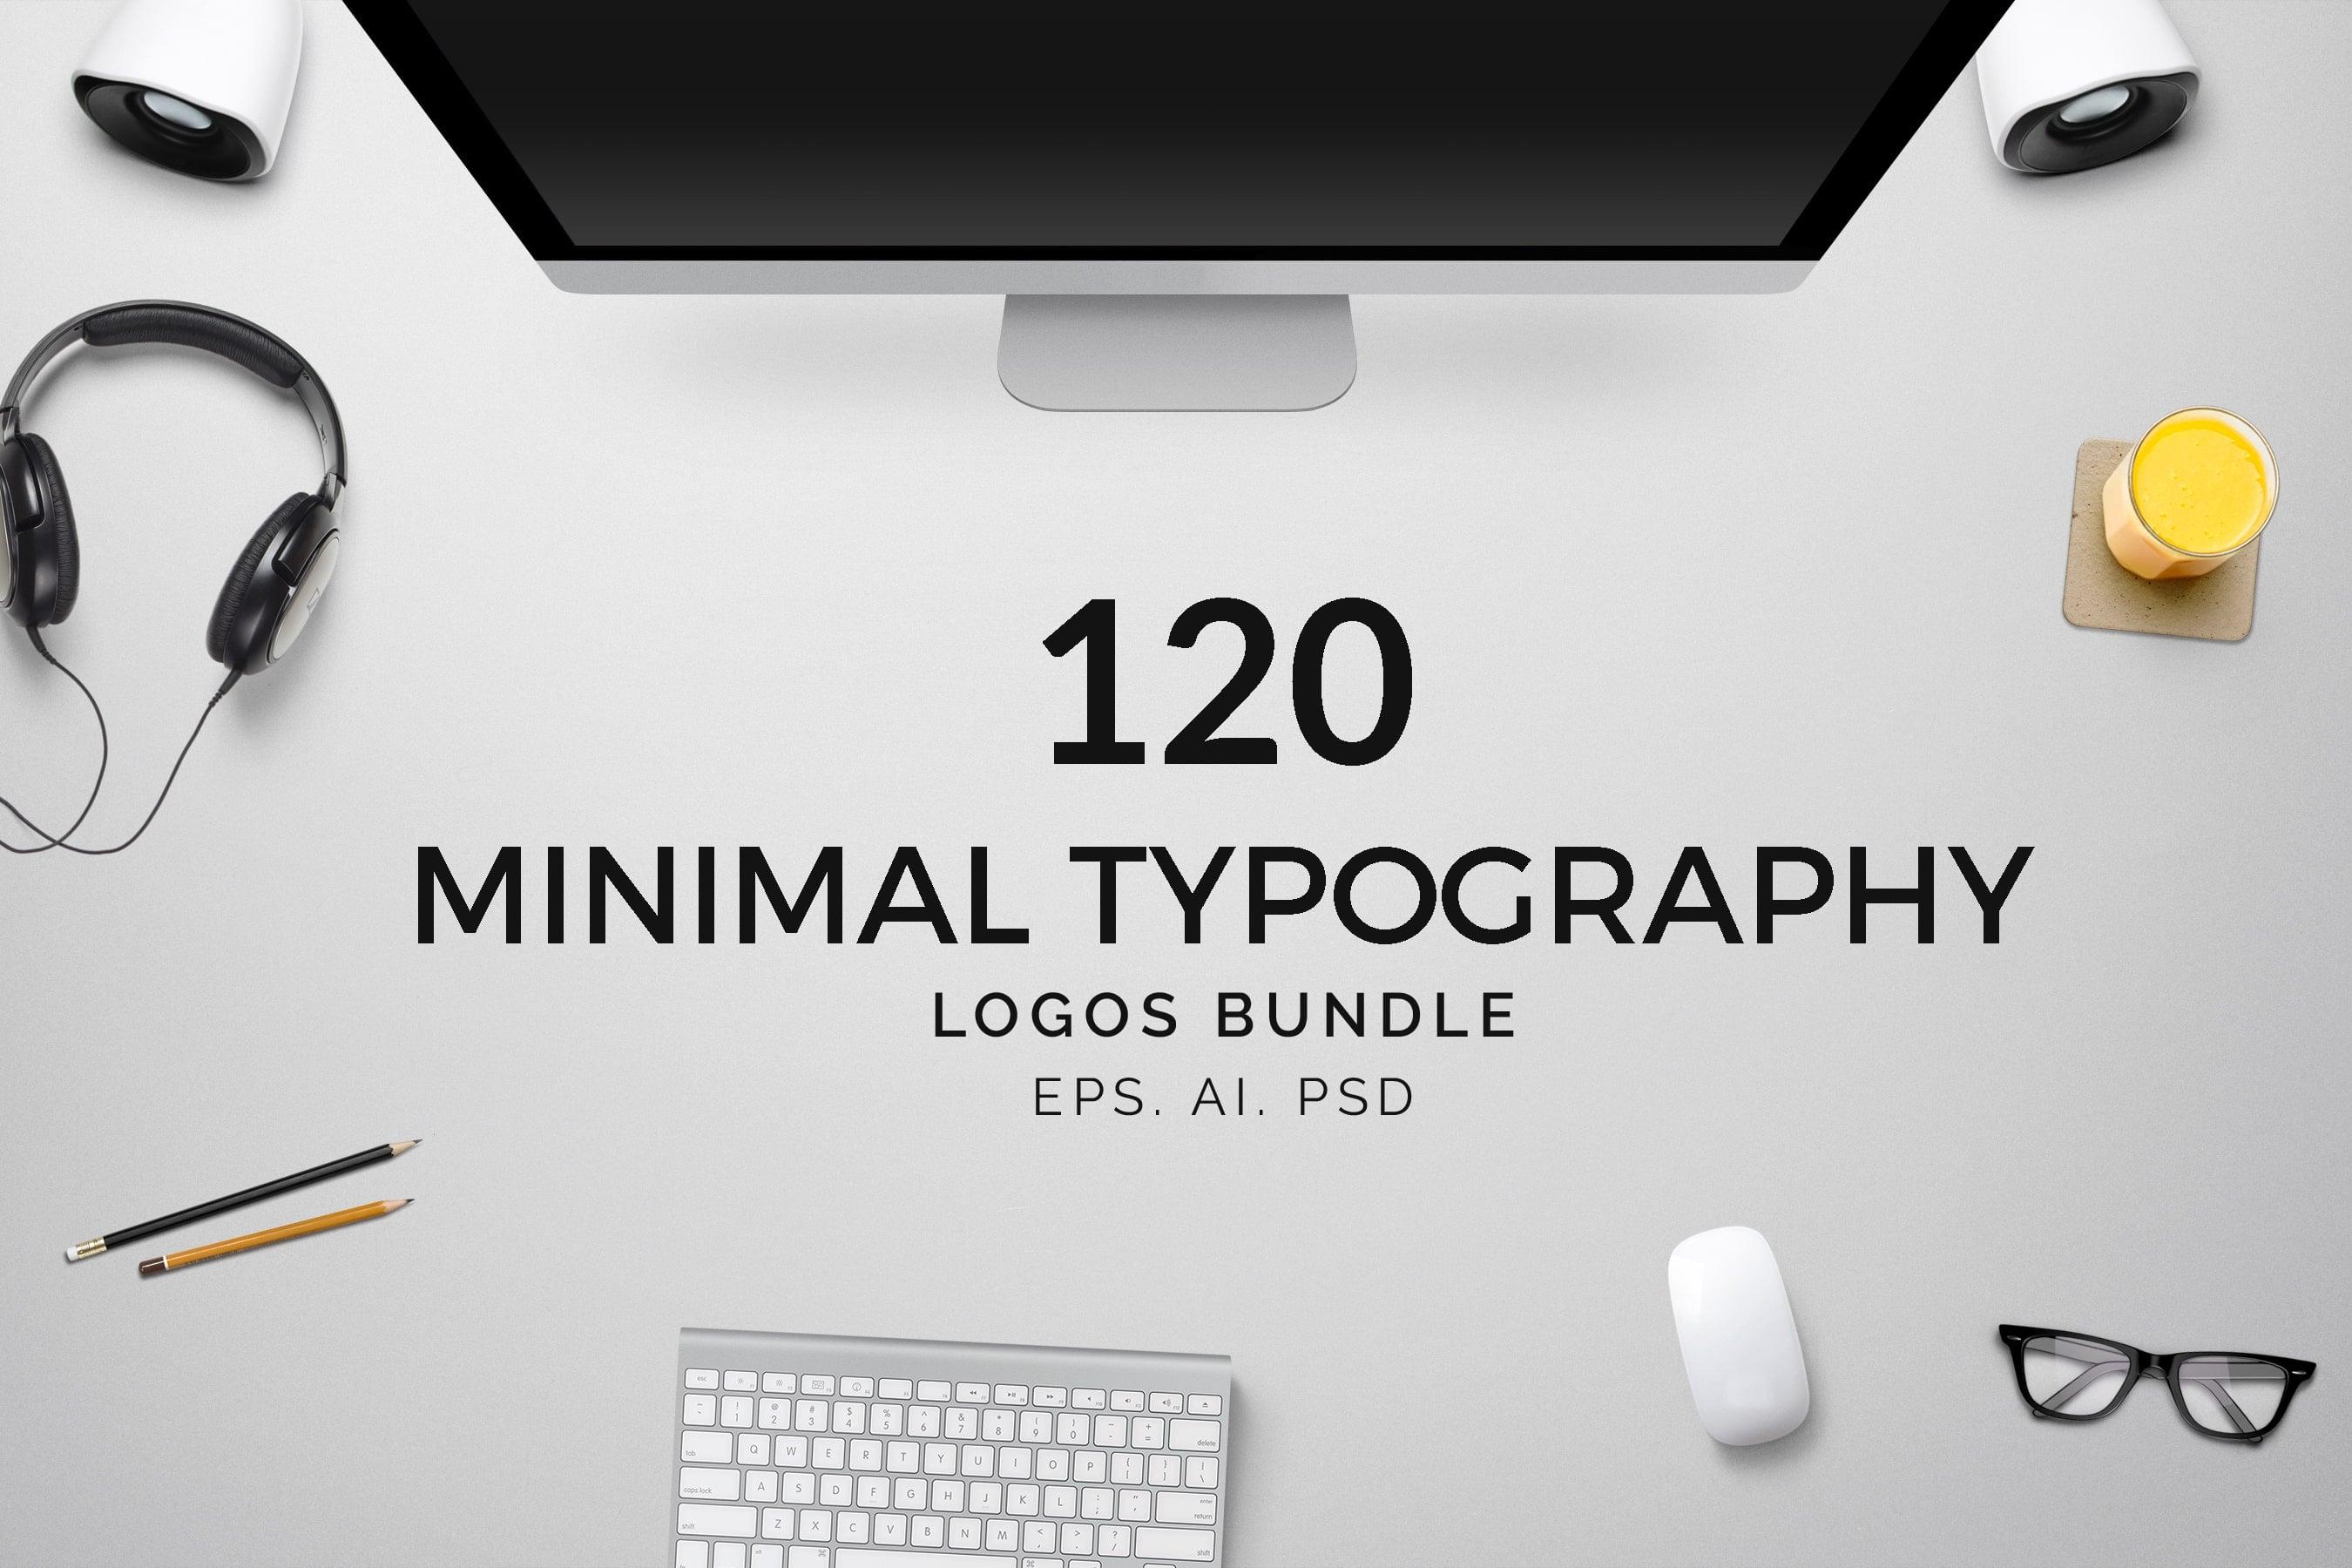 520 Premade Logo Bundle + Bonus - just $24 - A preview 01 min